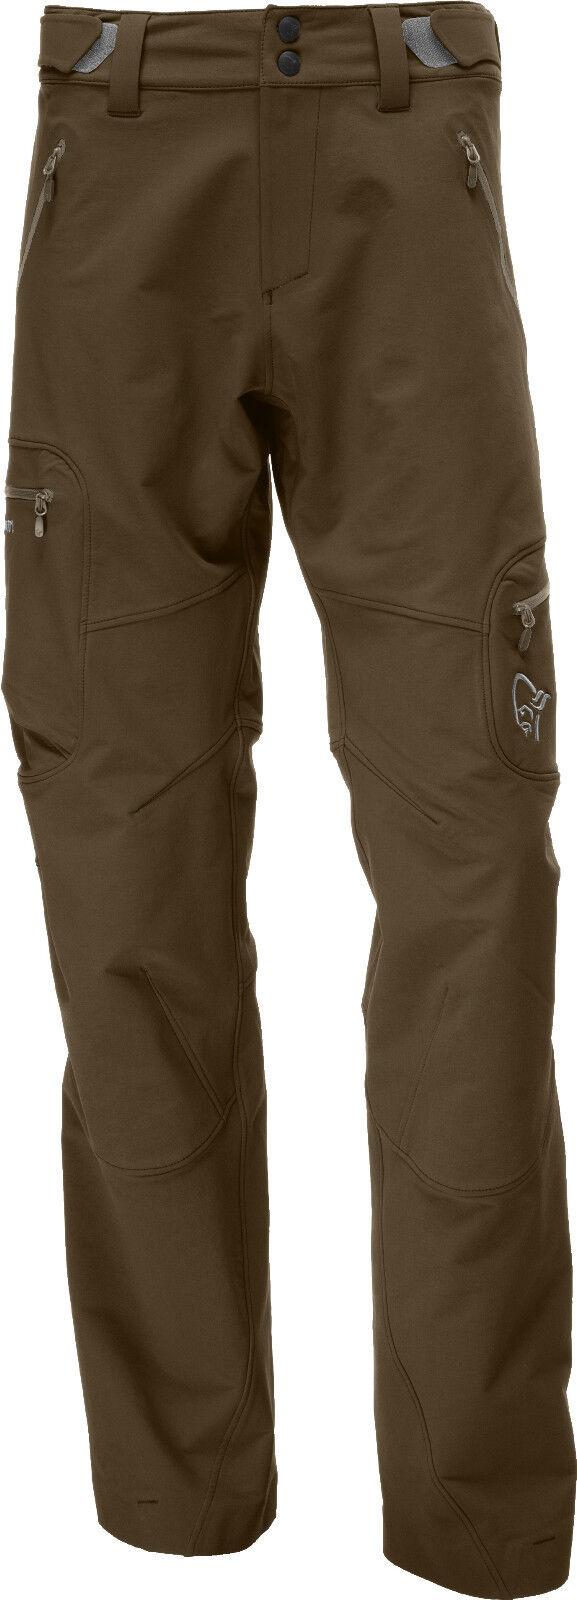 Norrona Svalbard flex1 Pant pantalones (m),  transpirable, resistente al agua Al aire librehose  Obtén lo ultimo